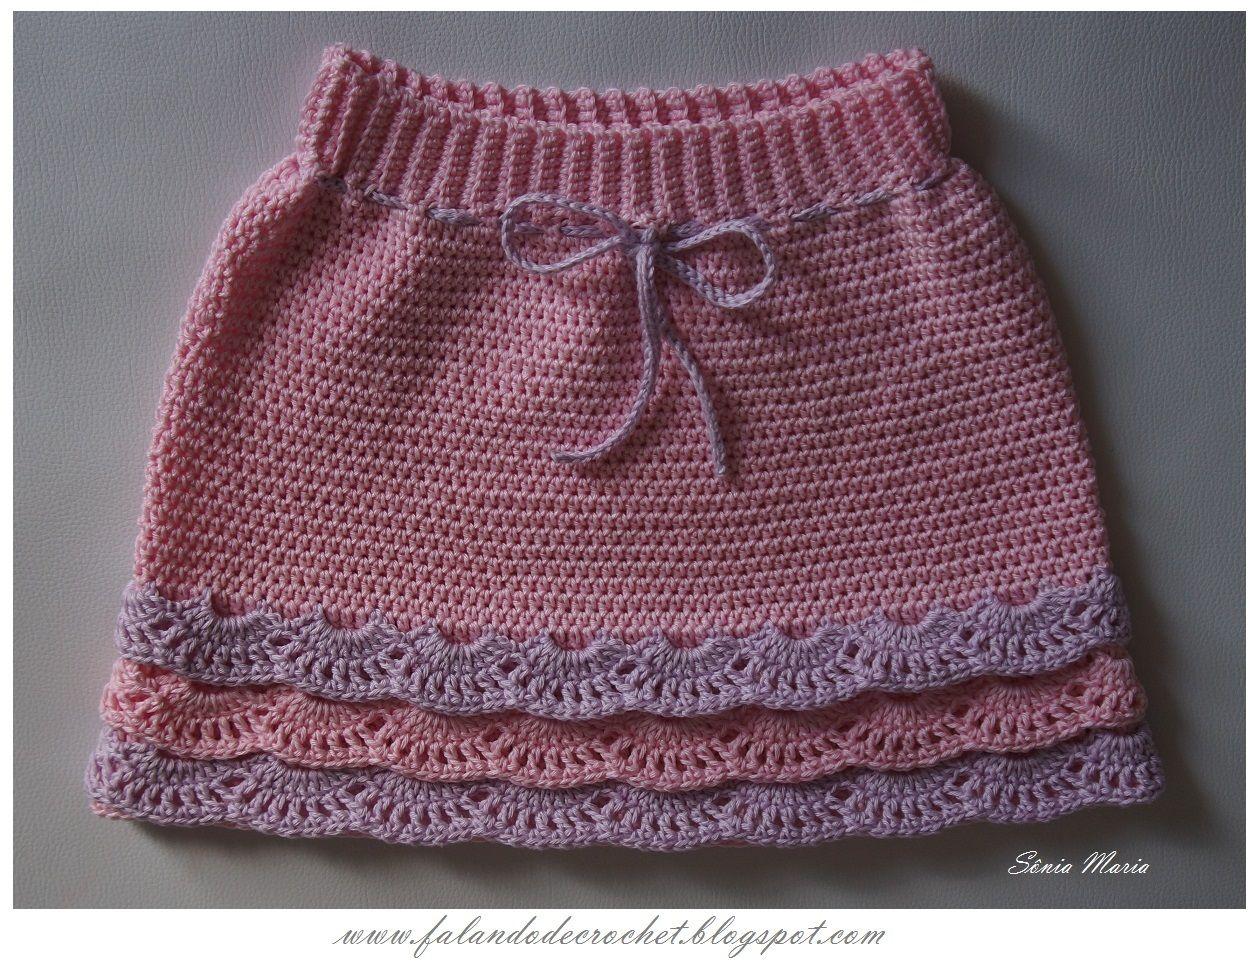 FALANDO DE CROCHET: SAIA DE CROCHE COM BABADOS | Crochet para bbs e ...